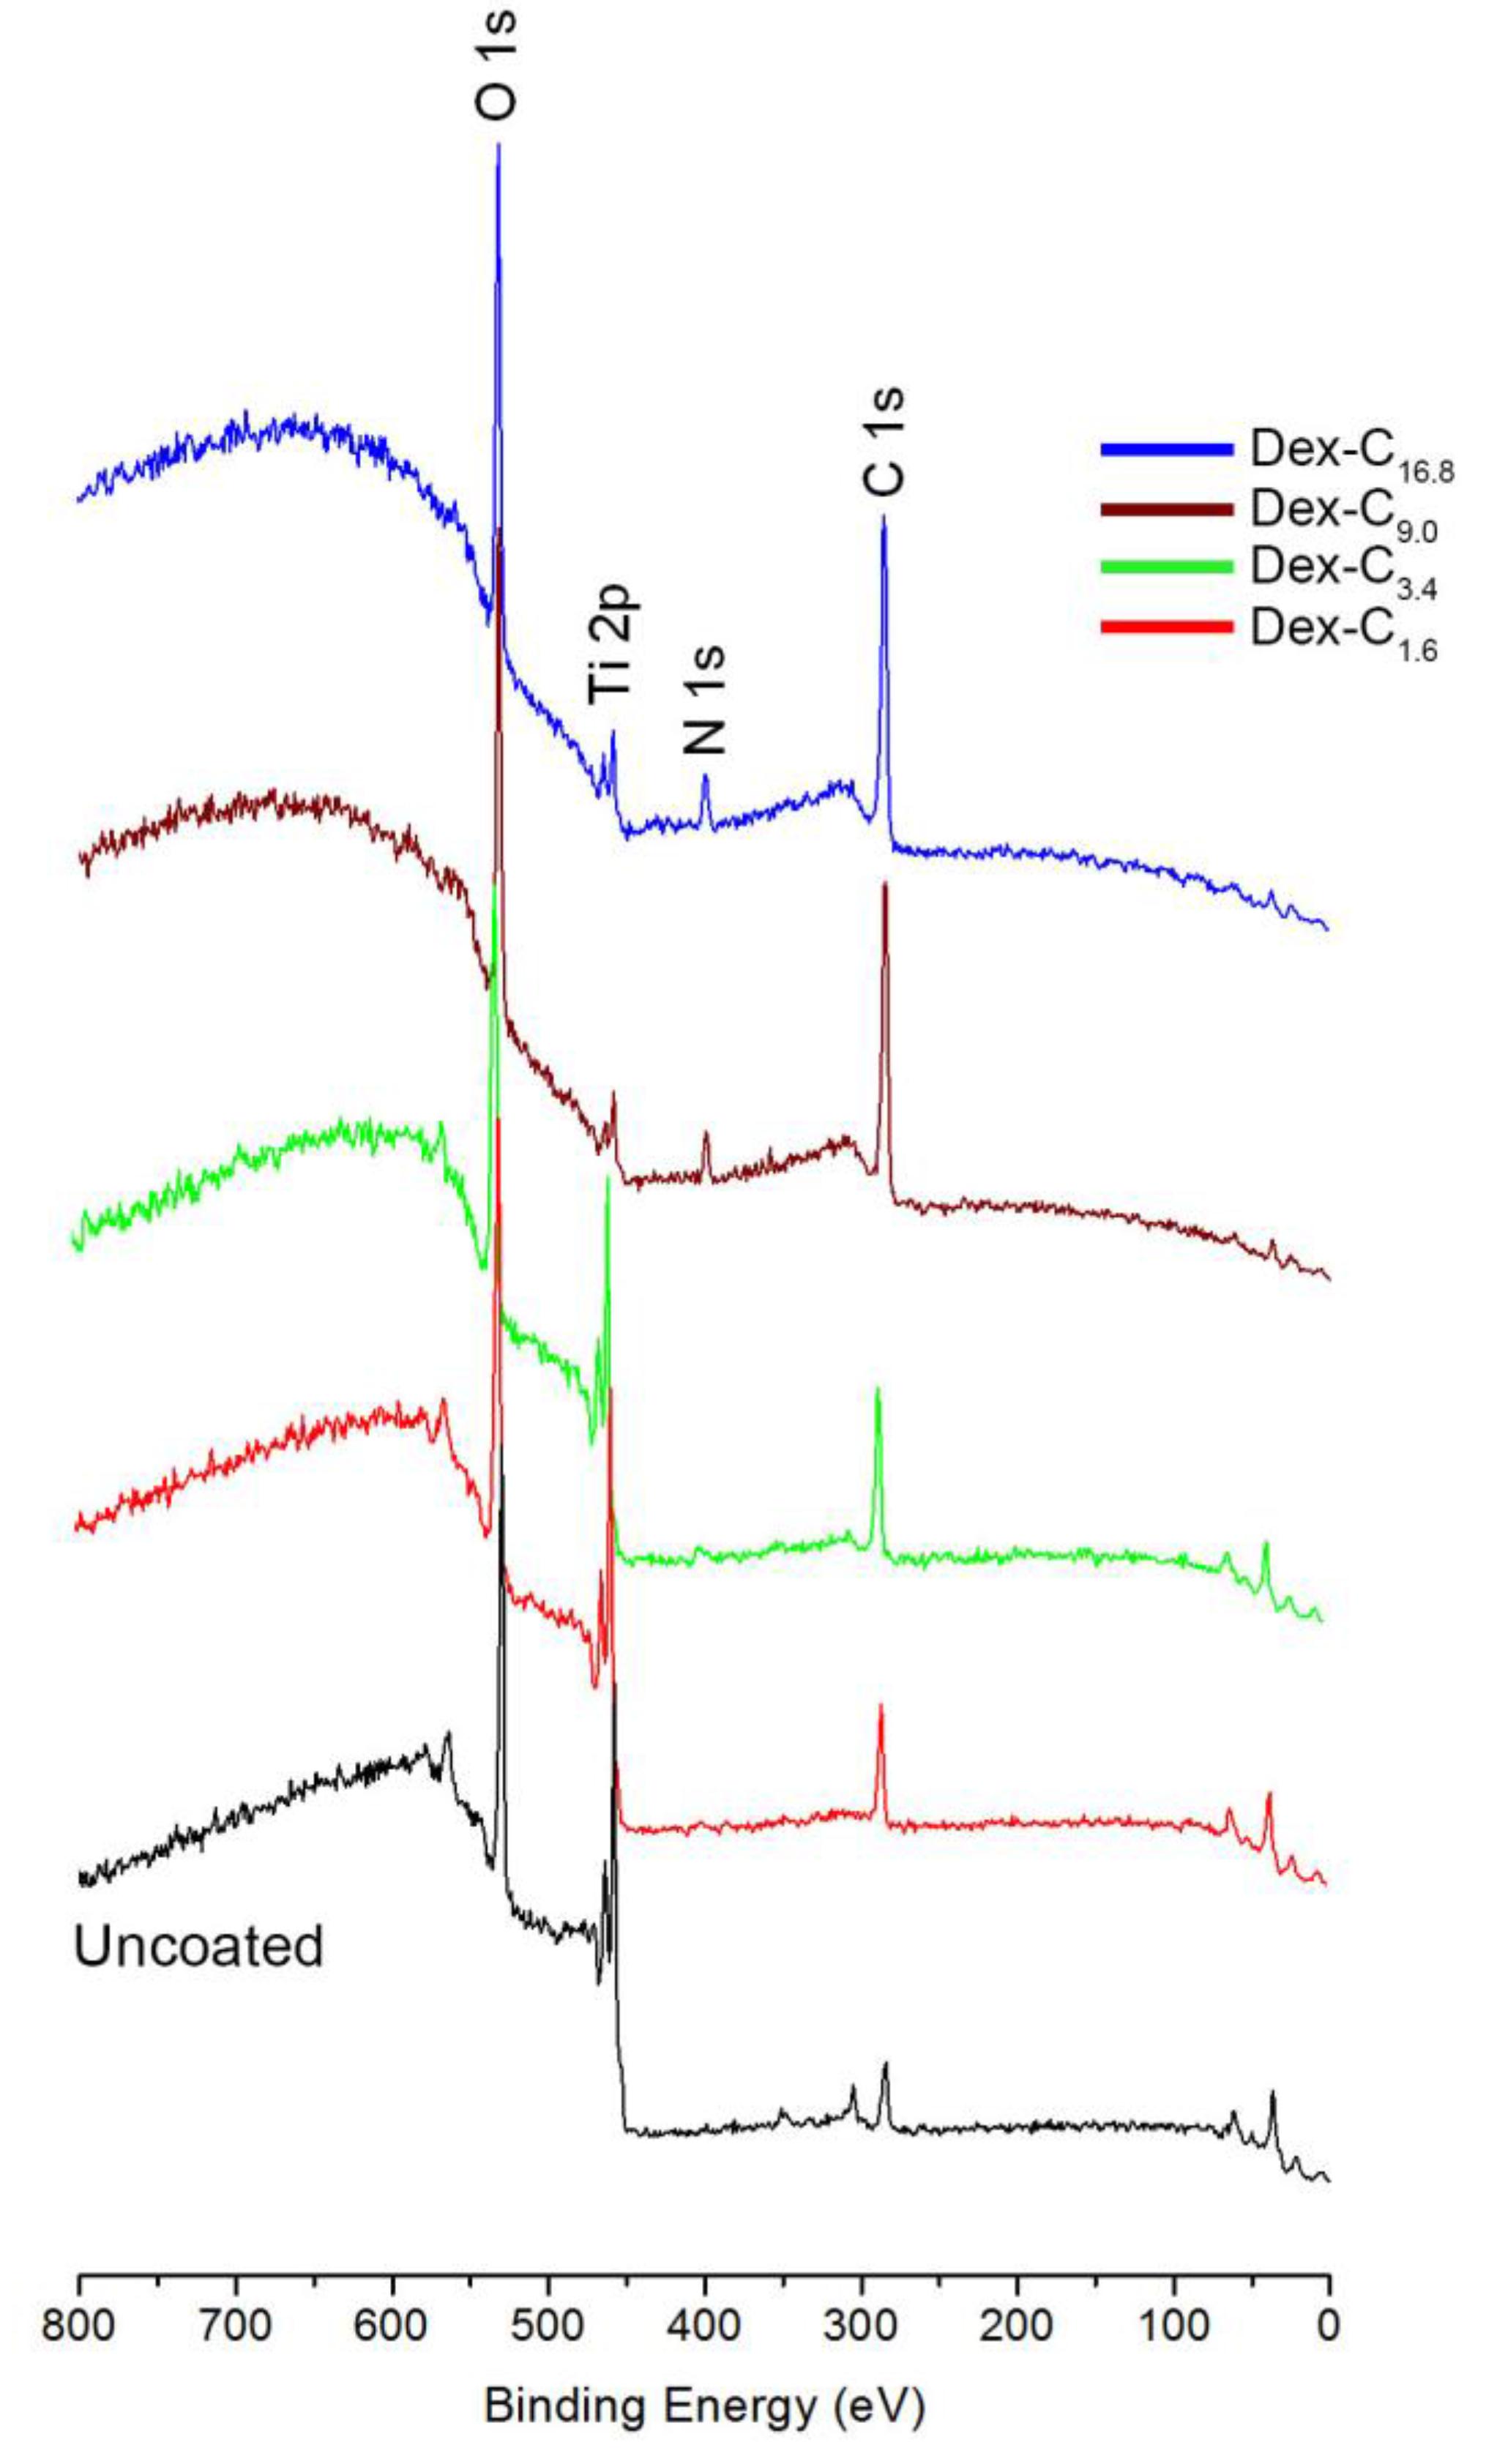 7th maxima stereo wiring diagram new model wiring diagramdoc] ➤ diagram 7th maxima stereo wiring diagram ebook schematicdiagram 7th maxima stereo wiring diagram